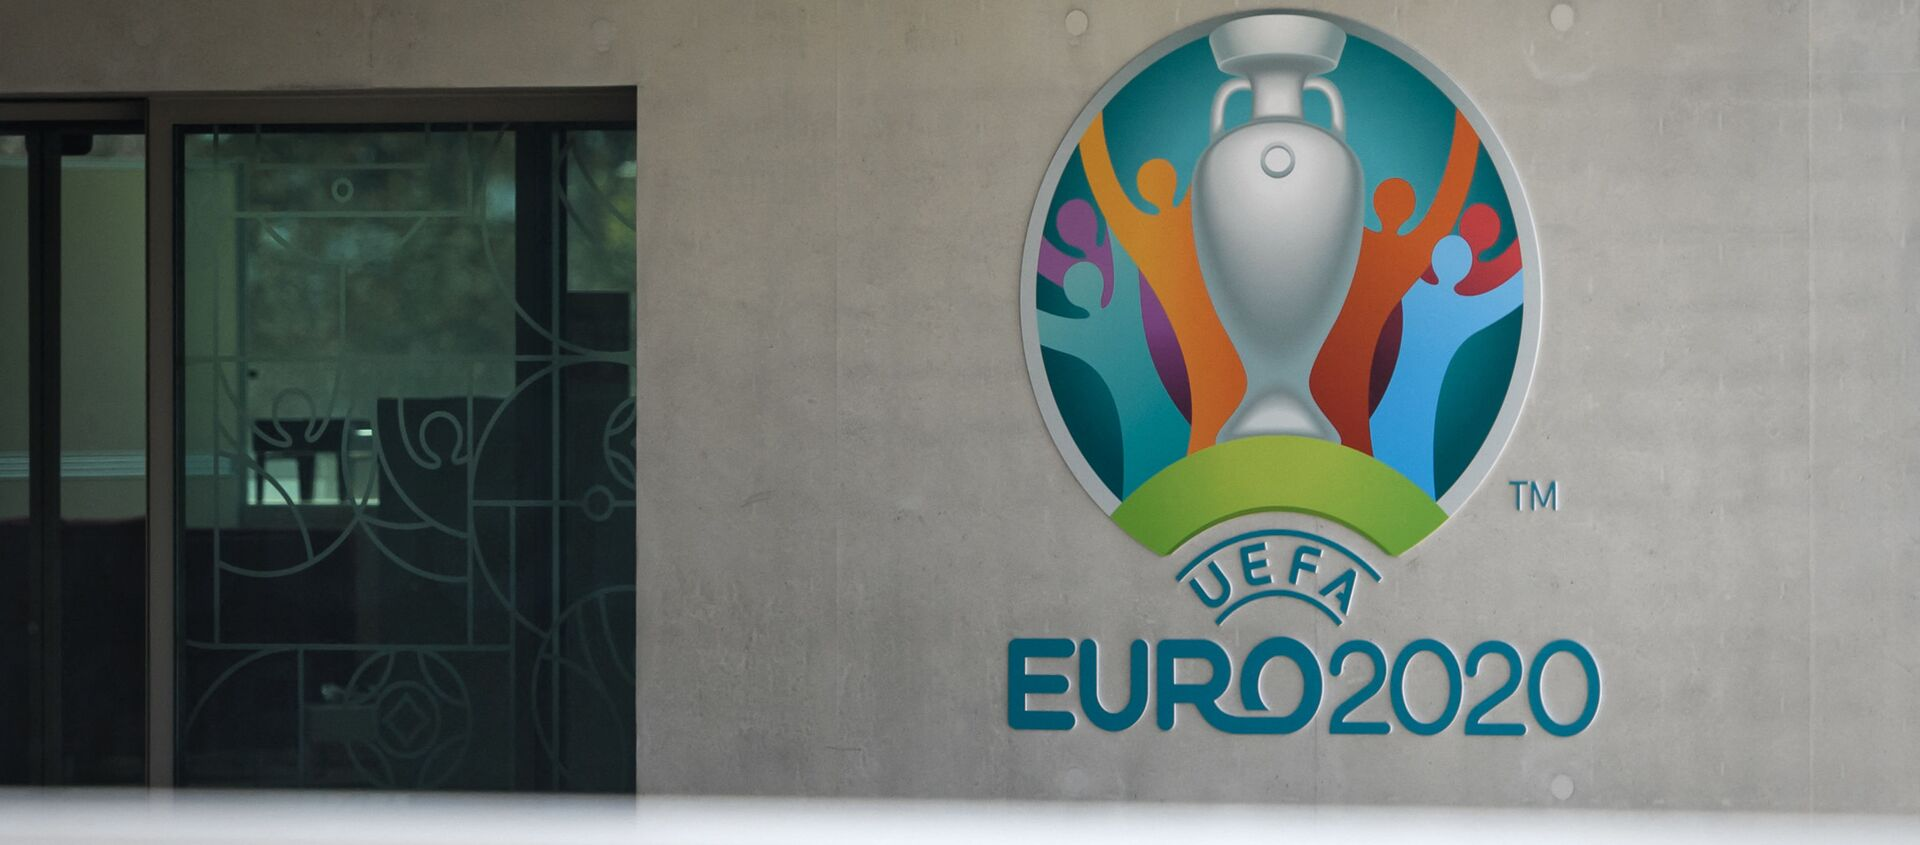 Логотип чемпионата Европы по футболу-2020 - Sputnik Беларусь, 1920, 25.02.2021